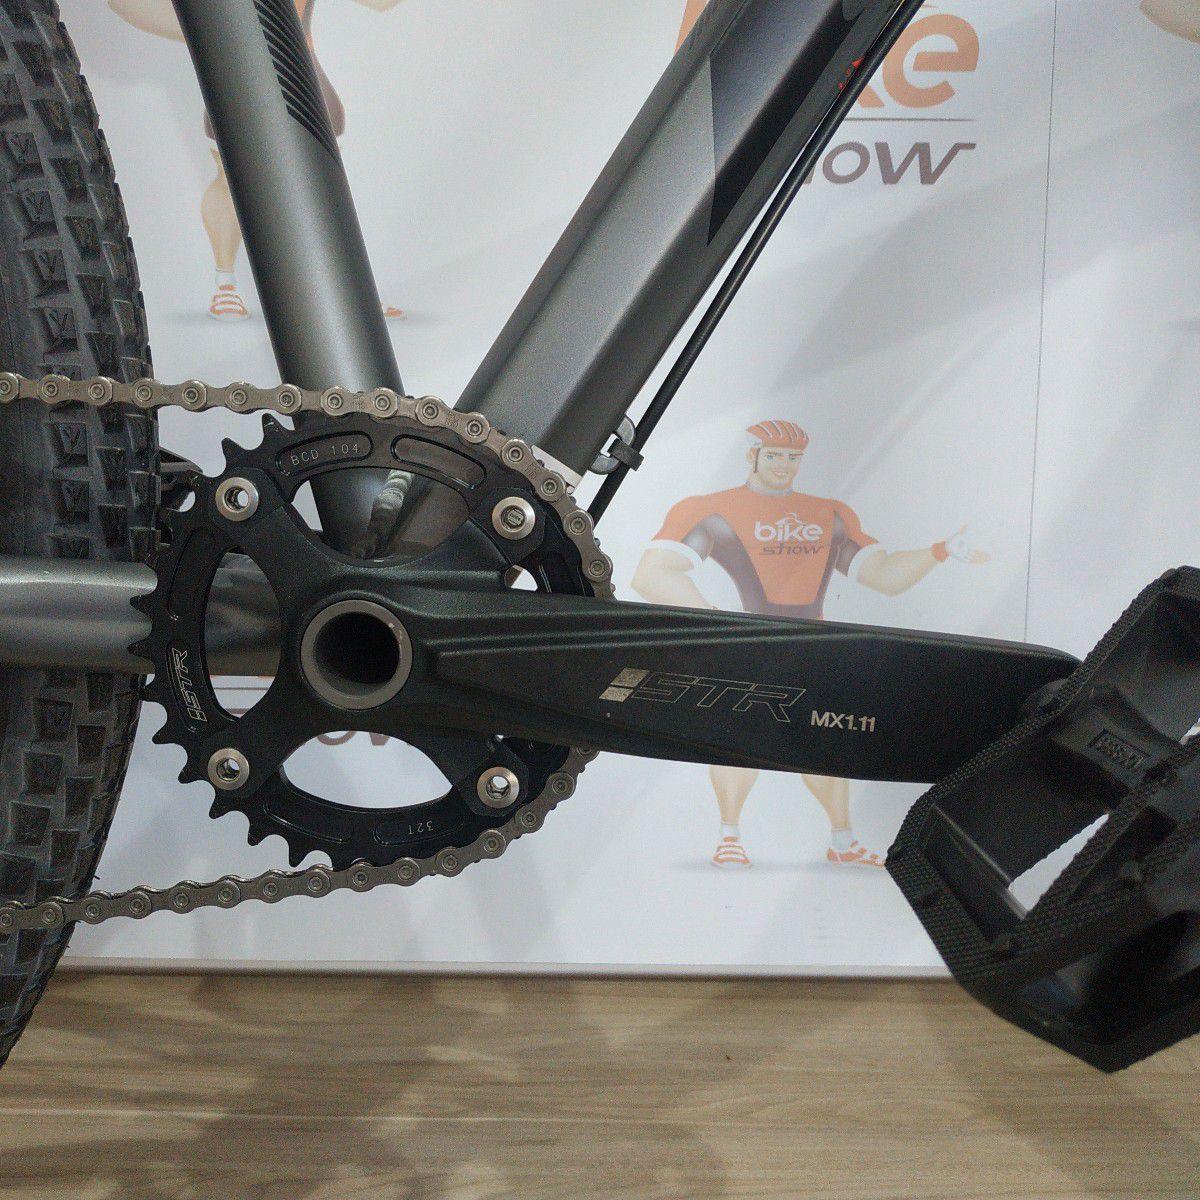 Bicicleta GTA Insane 29 - 11V Sram NX traseiro - Freio Hidráulico High One